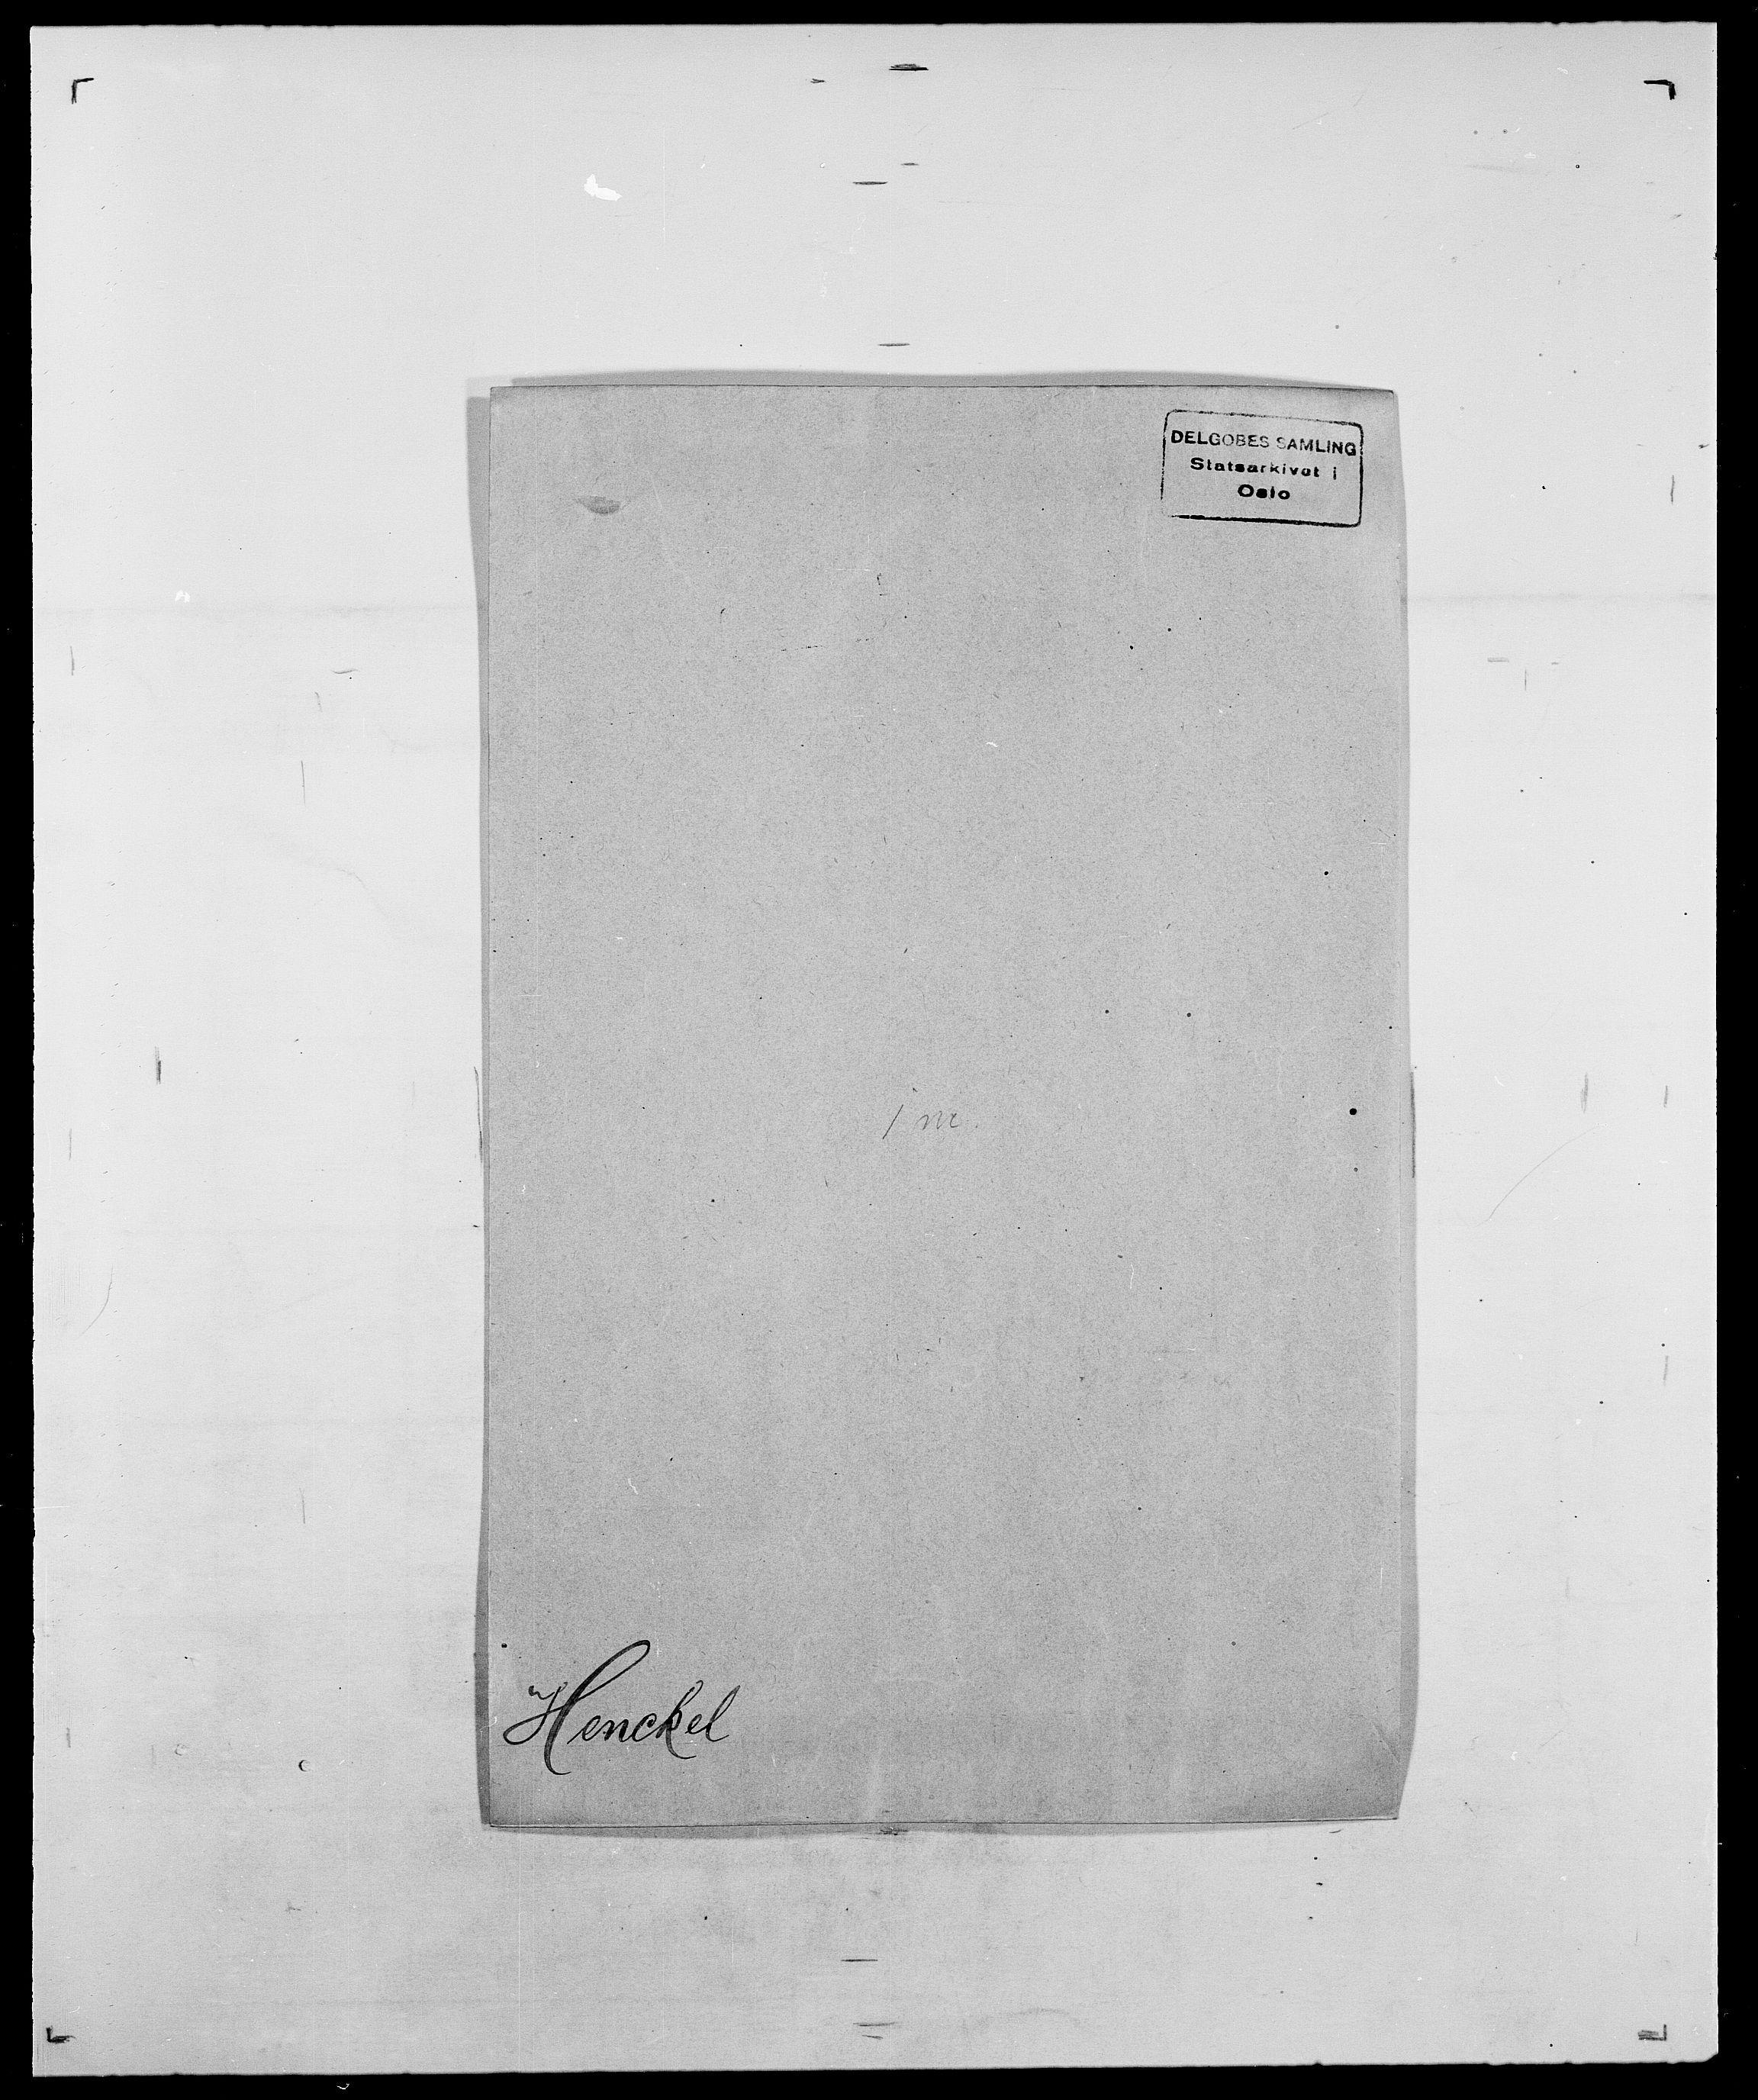 SAO, Delgobe, Charles Antoine - samling, D/Da/L0017: Helander - Hjørne, s. 171